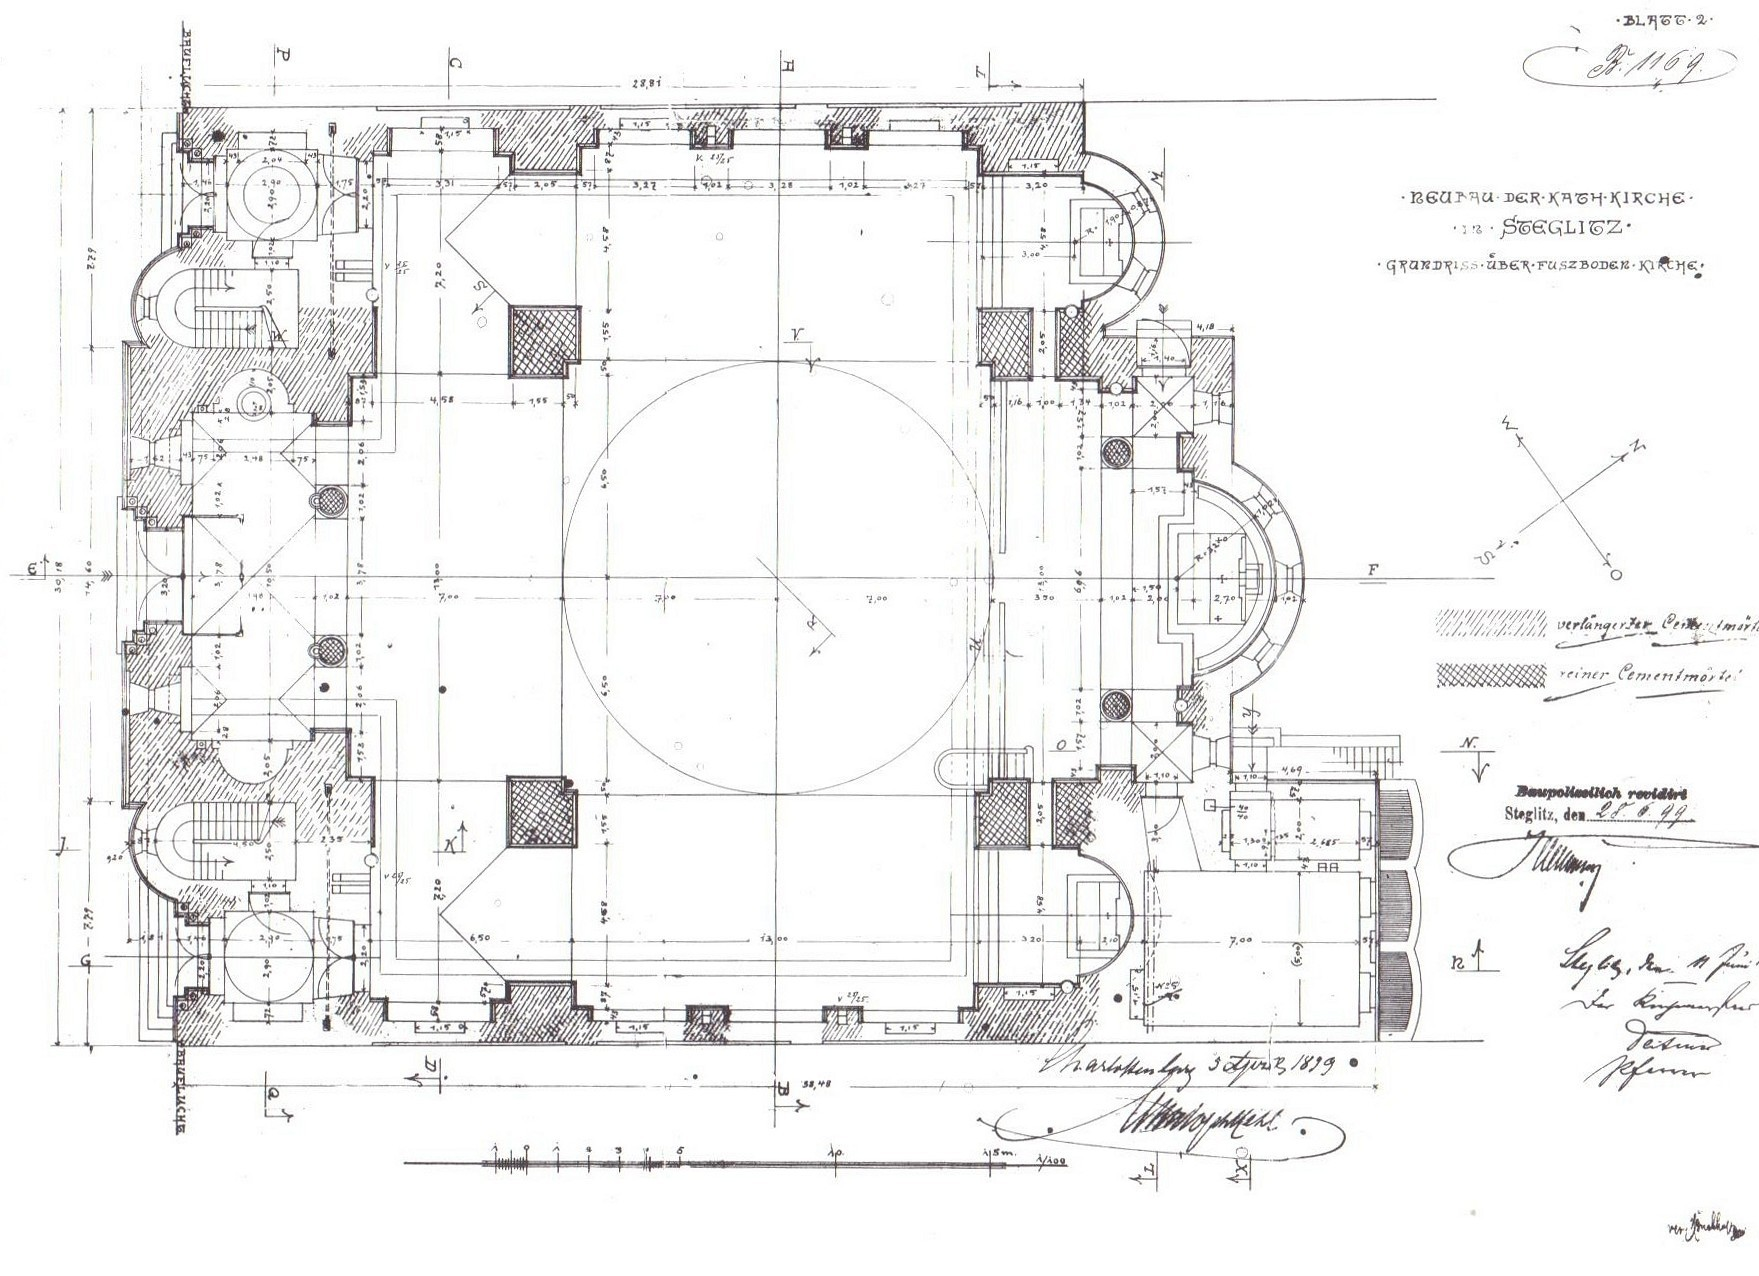 File:Berlin Rosenkranz-Basilika Grundrisszeichnung Hehl.jpg ... size: 1759 x 1276 post ID: 3 File size: 0 B